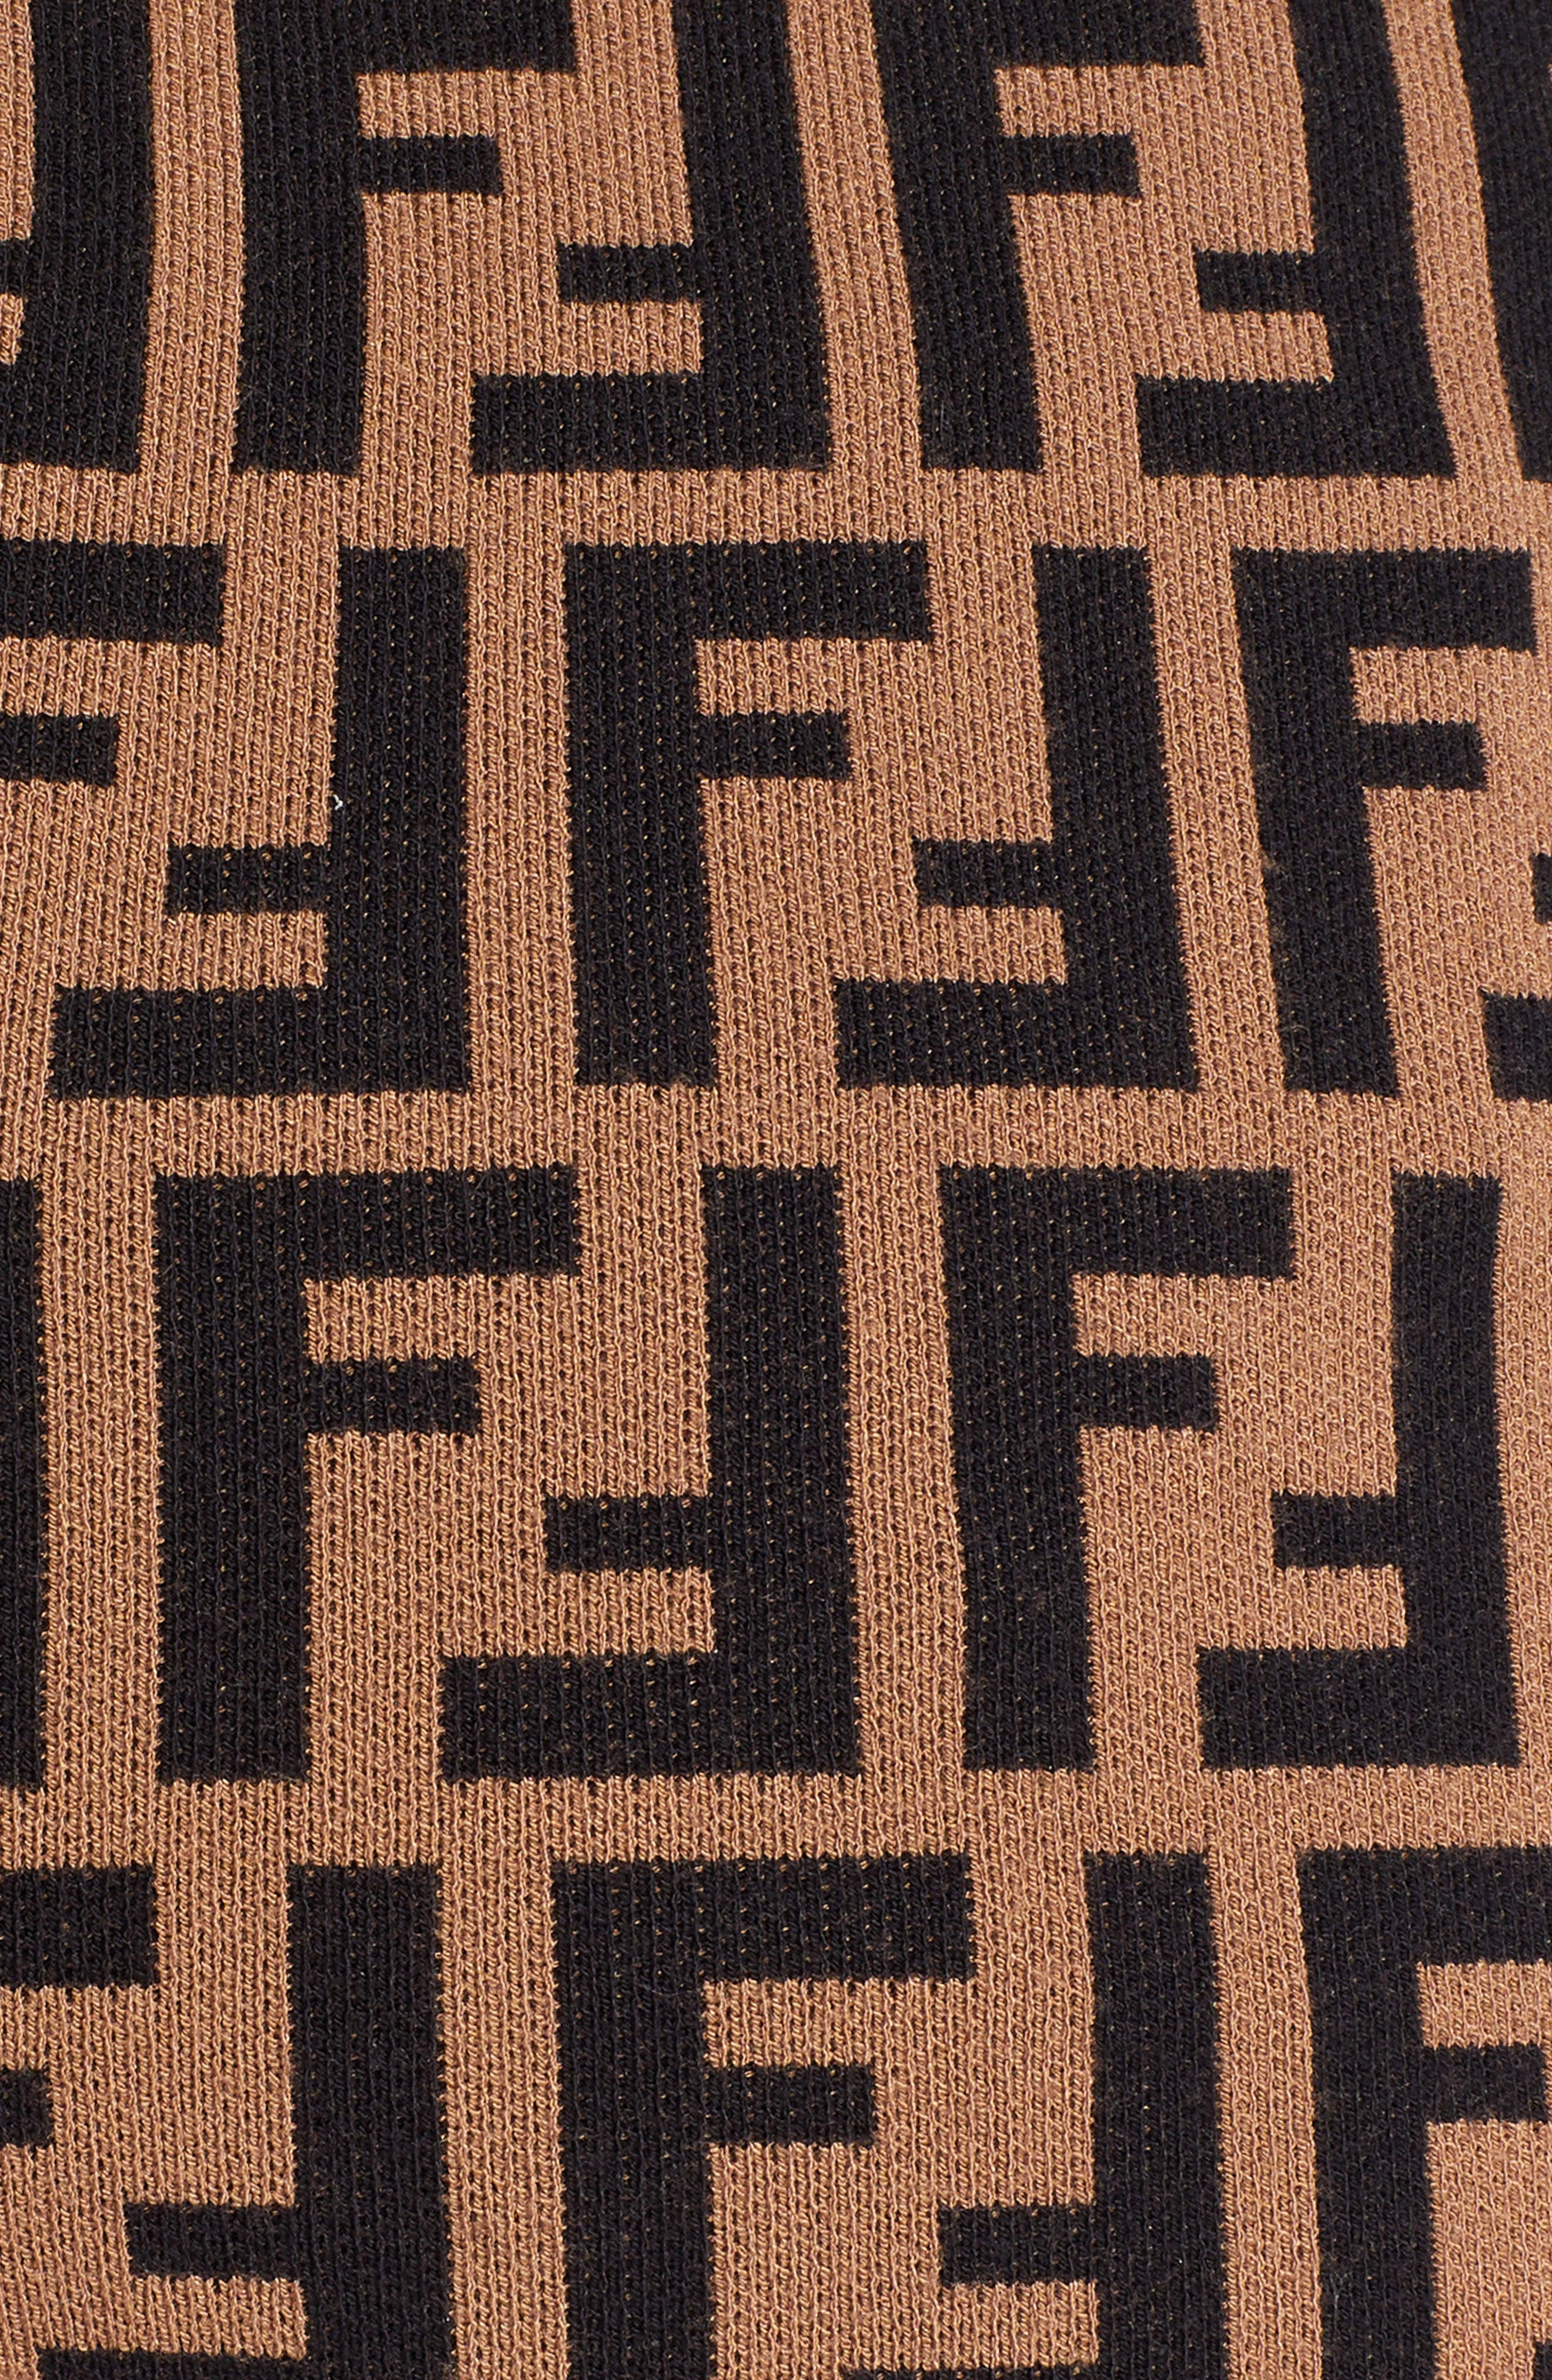 FENDI,                             Logo Leggings,                             Alternate thumbnail 5, color,                             201